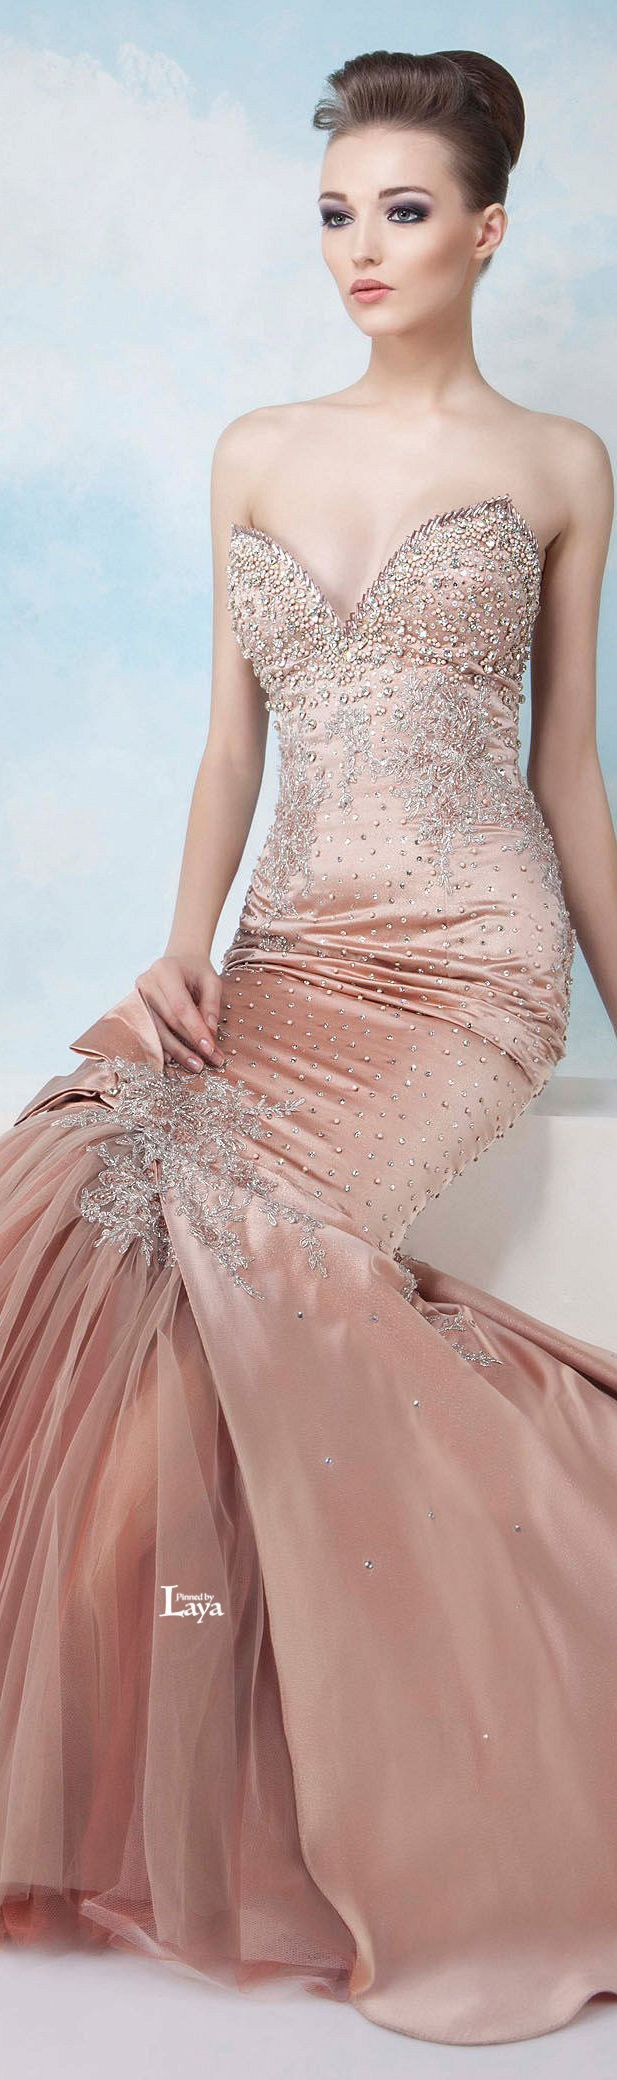 Asombroso Vestidos De Dama De Honor Costa Debenhams Regalo ...